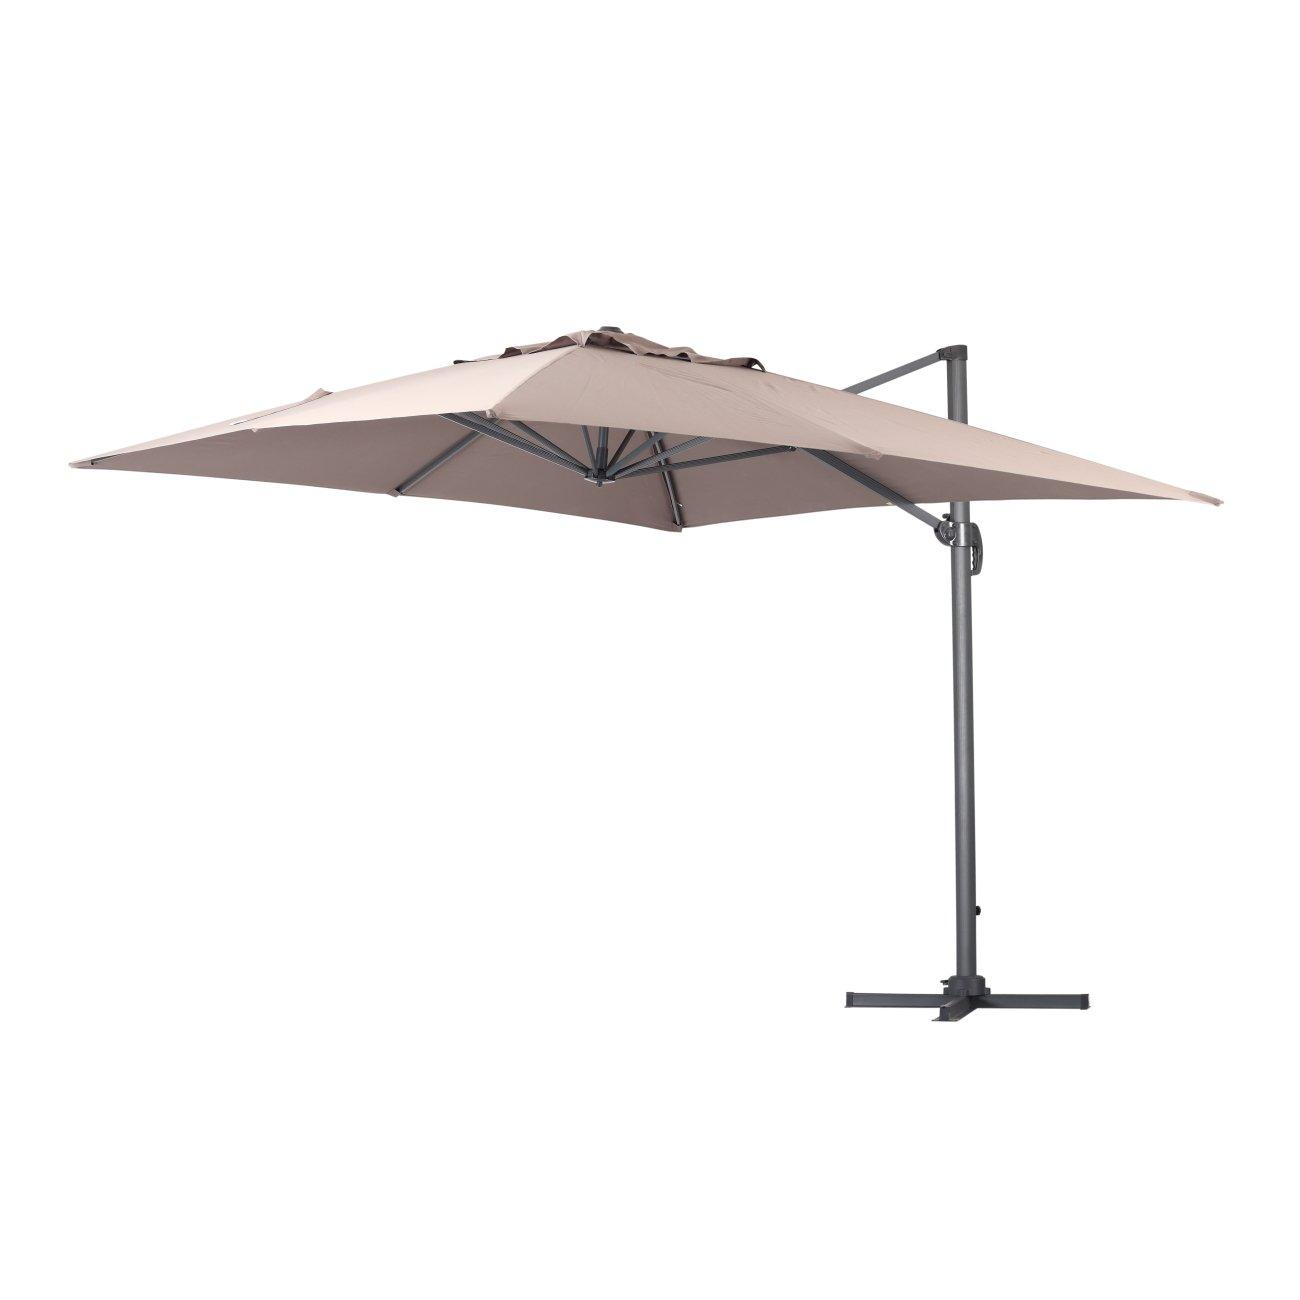 Get Quotations Green Garden Deluxe 10 X Feet Cantilever Offset Patio Umbrella Square Parasol Infinite Tilt Position